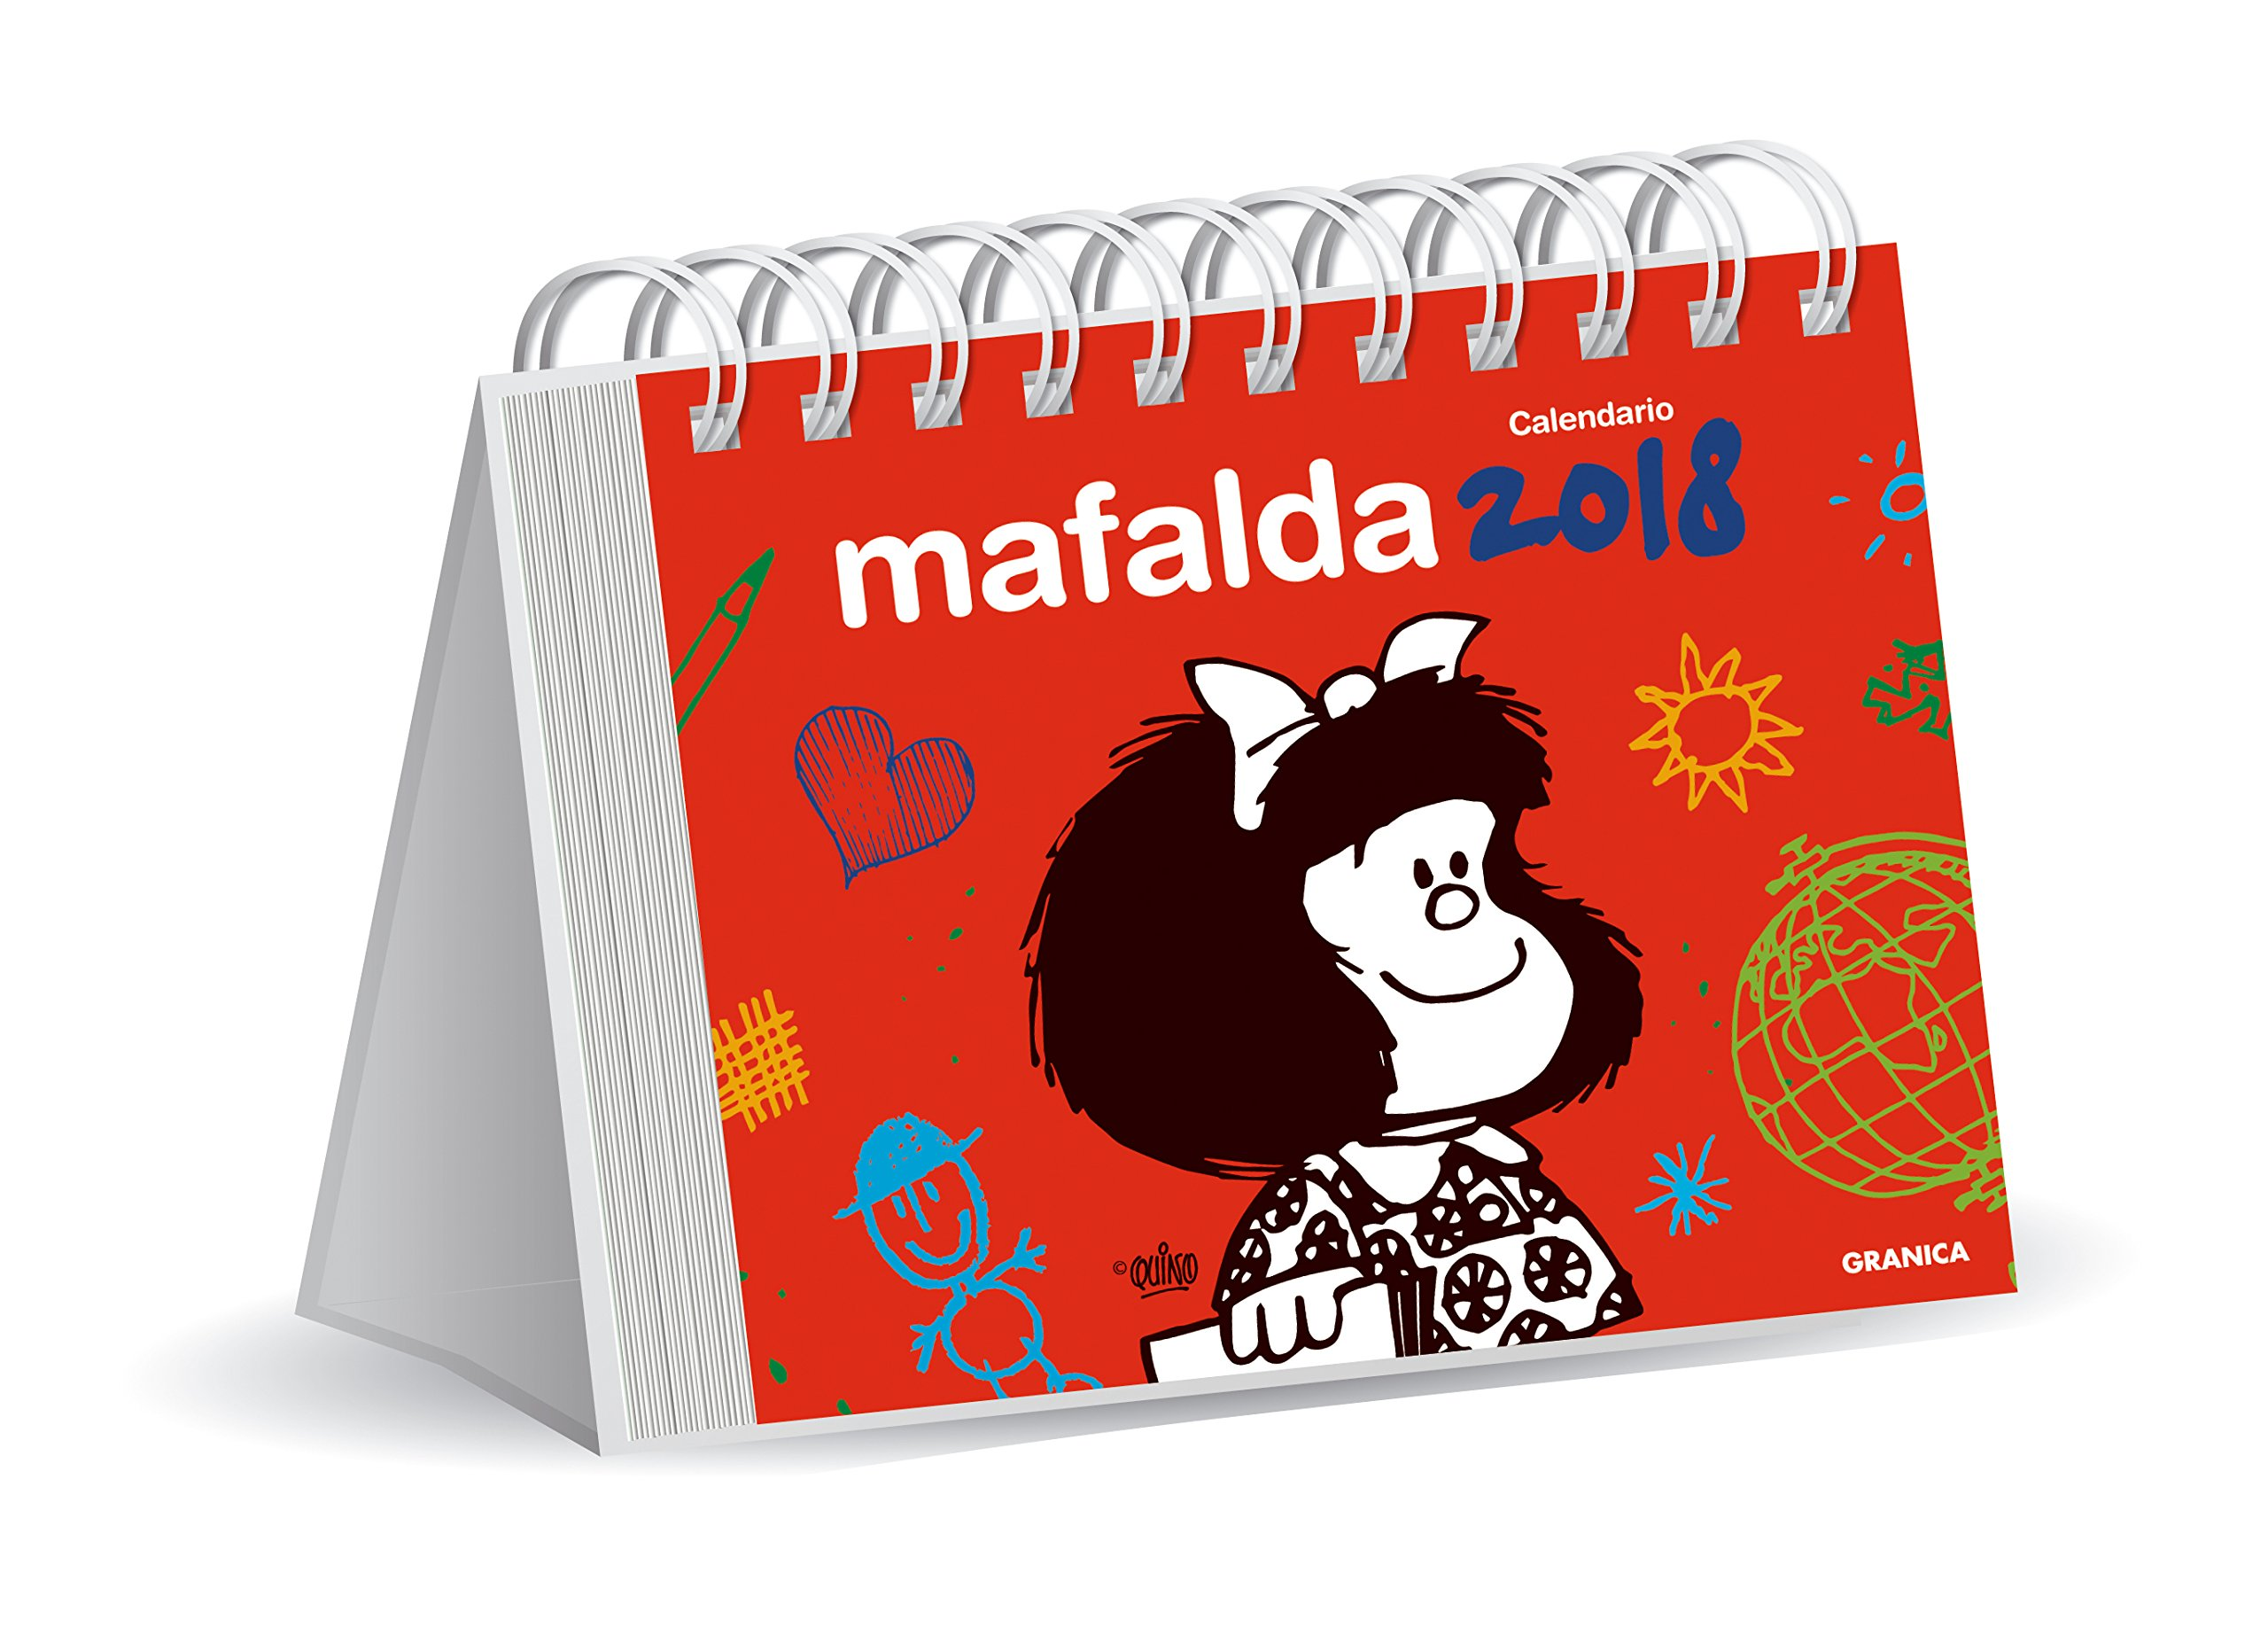 Mafalda 2018 Calendario de escritorio - Rojo (Spanish ...